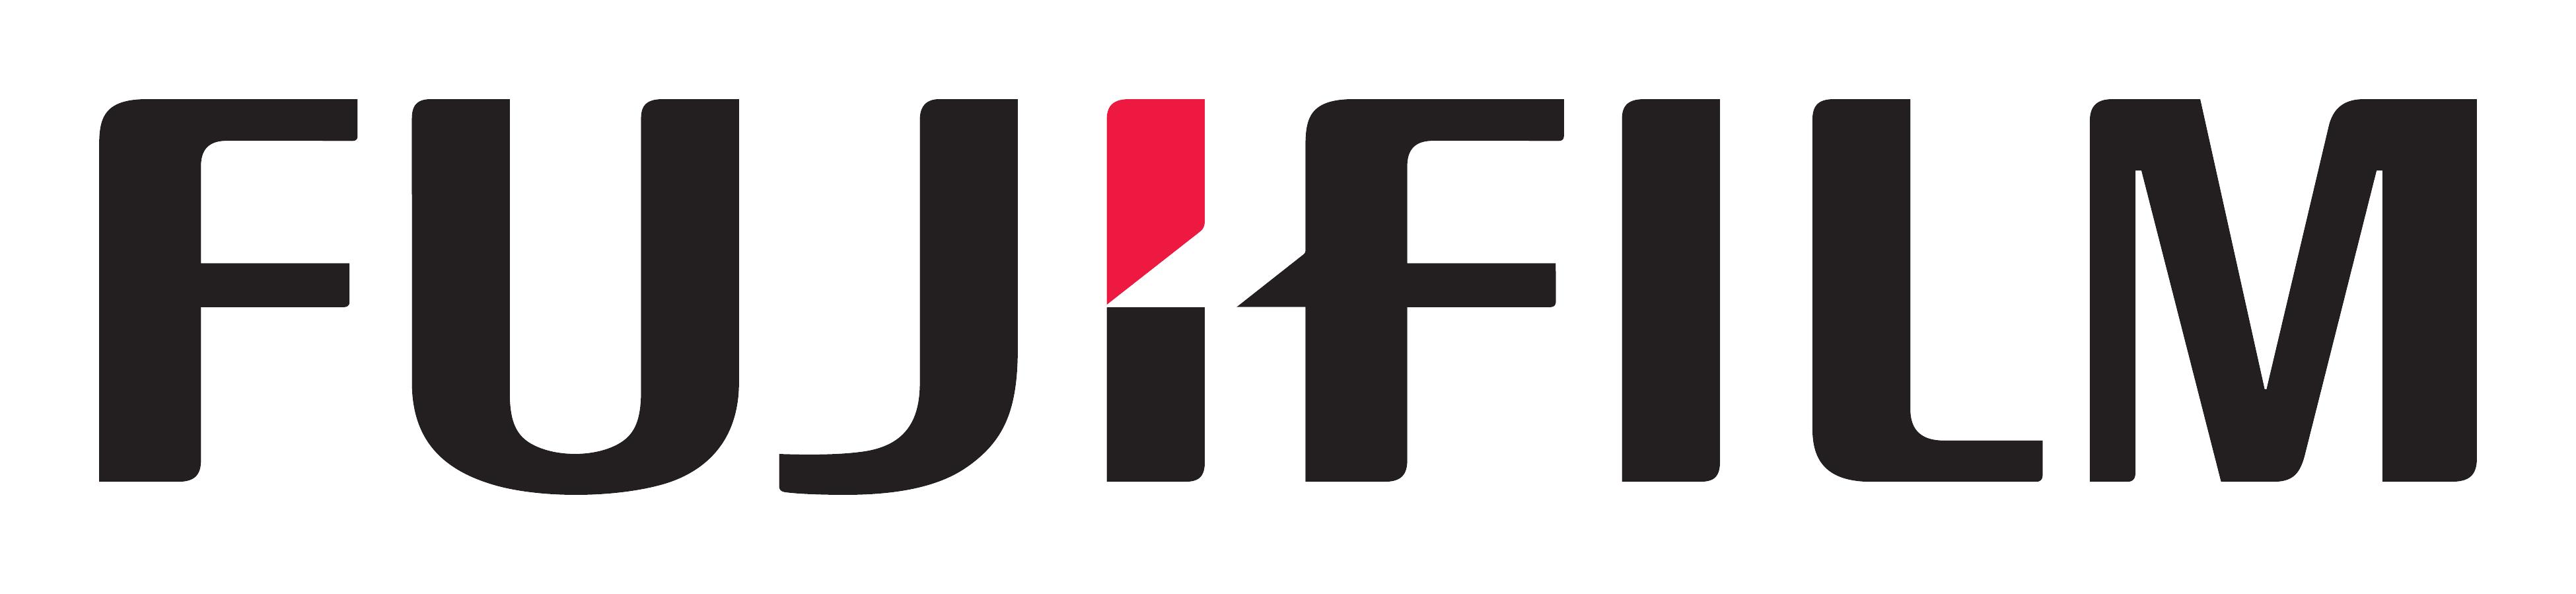 Fuji Professional Disc Storage Media Recording Media New